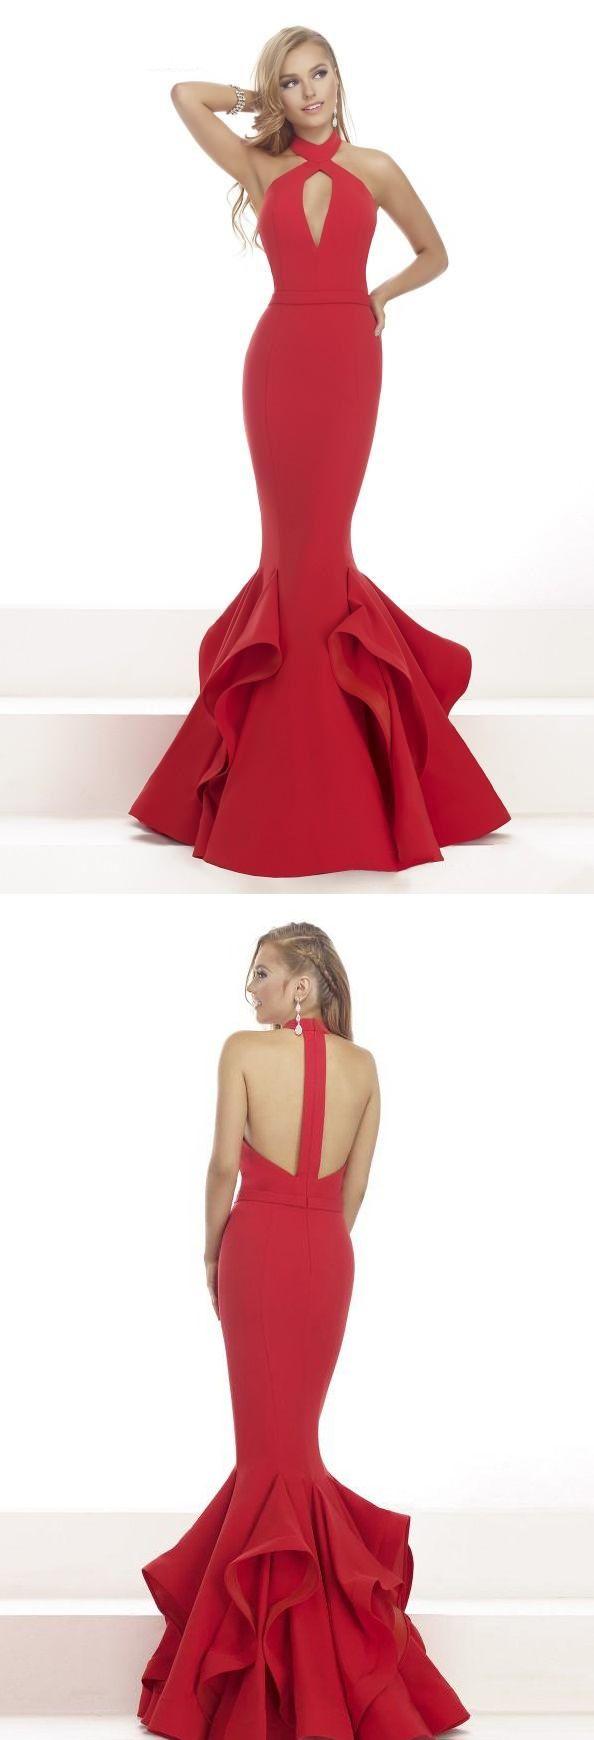 Chic modern long trumpetmermaid strapless ruffled red satin prom